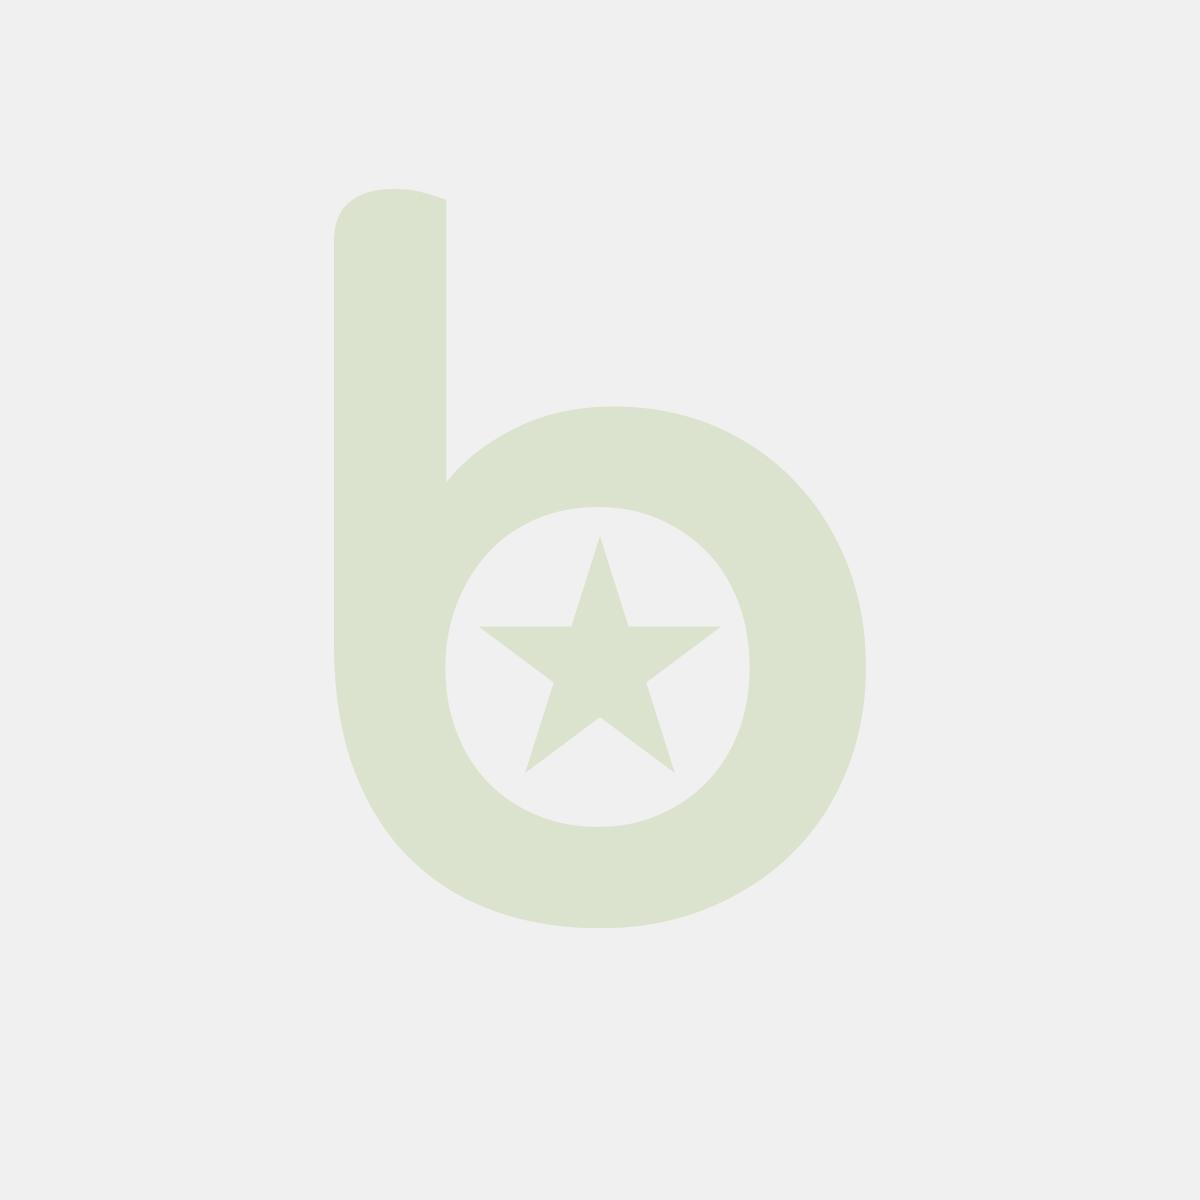 FINGERFOOD - patyczki 12cm WĄSY op. 100 sztuk